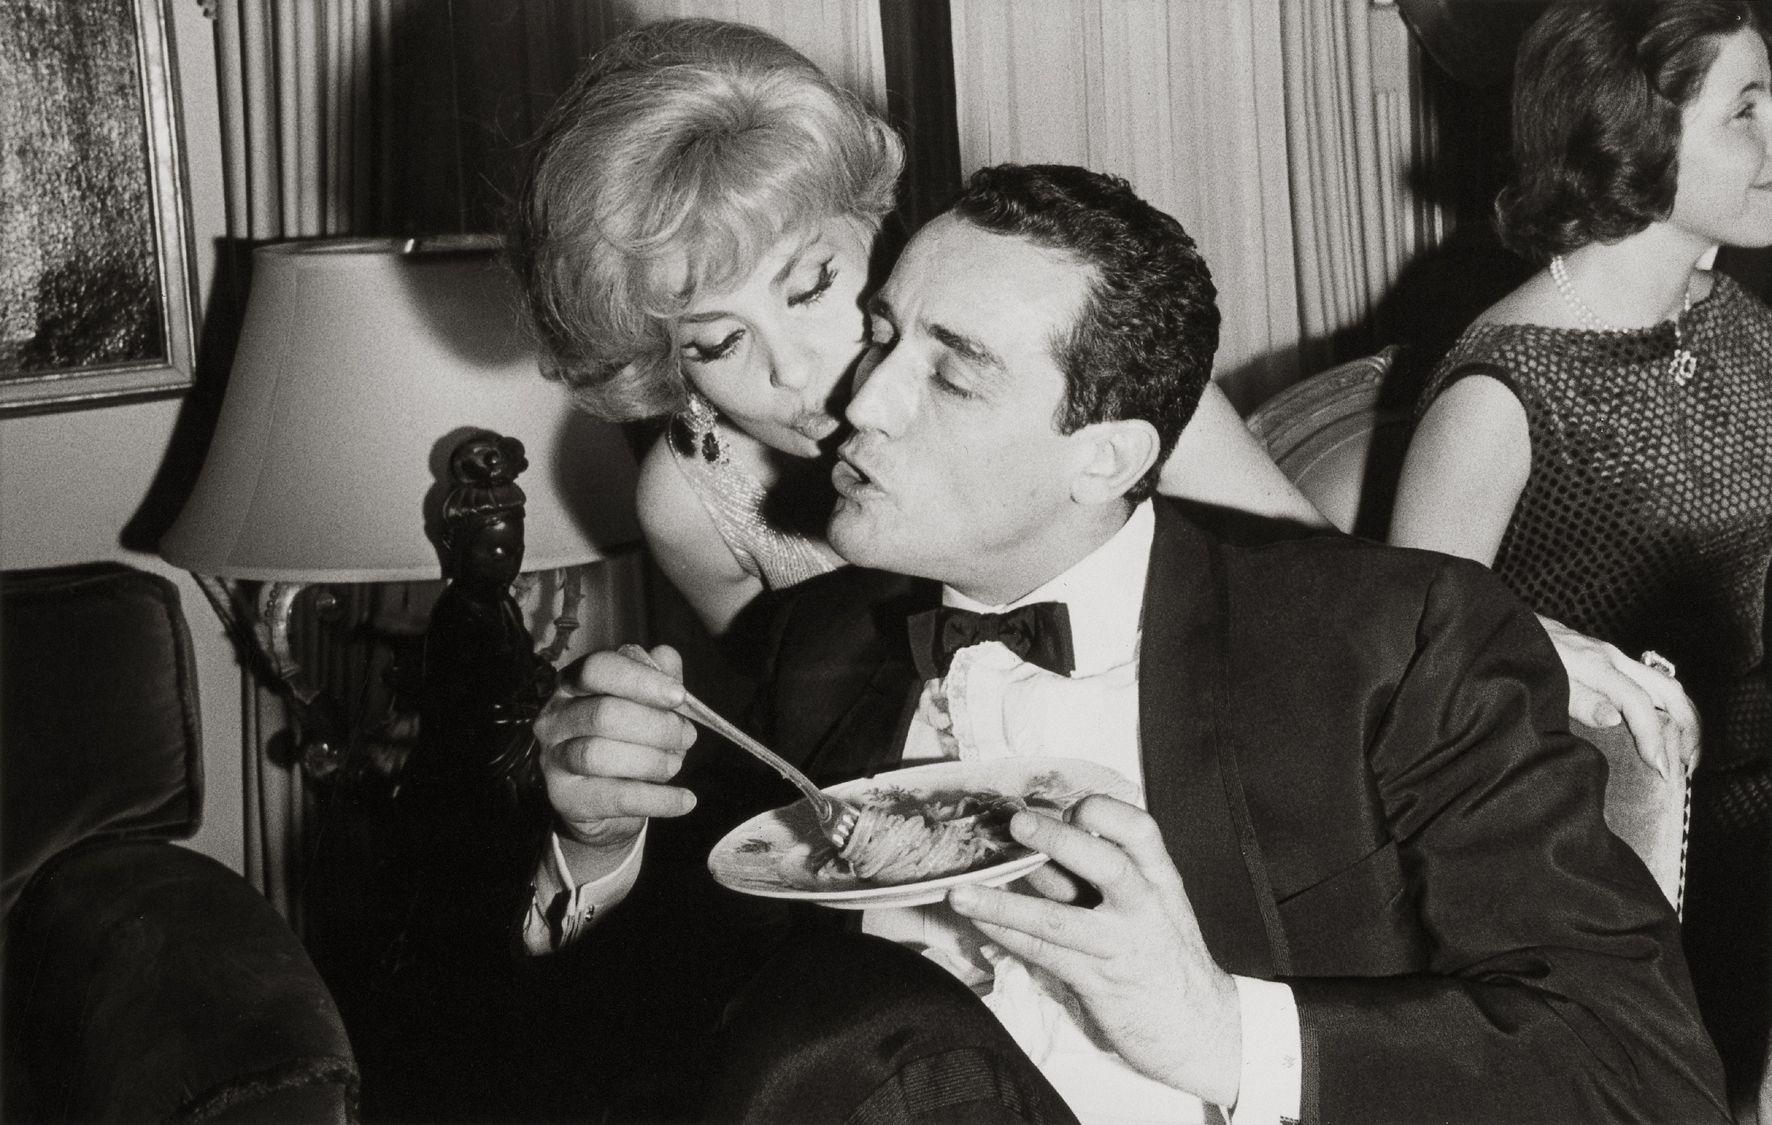 Gina Lollobrigida E Vittorio Gassman Gina Lollobrigida Vintage Italian Posters People Eating